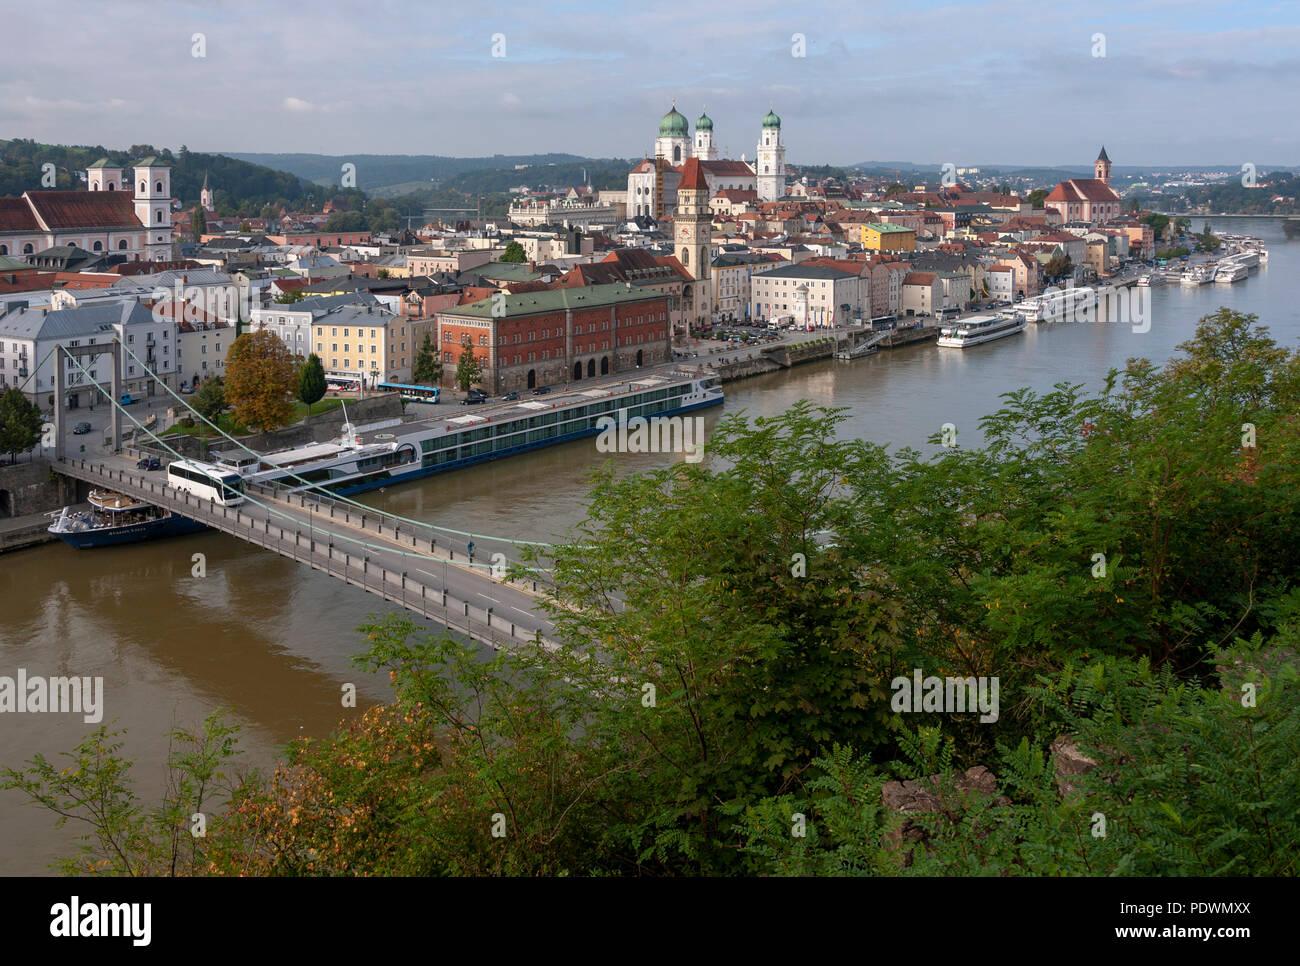 Passau, Stadtansicht. Totale von Veste Oberhaus - Stock Image